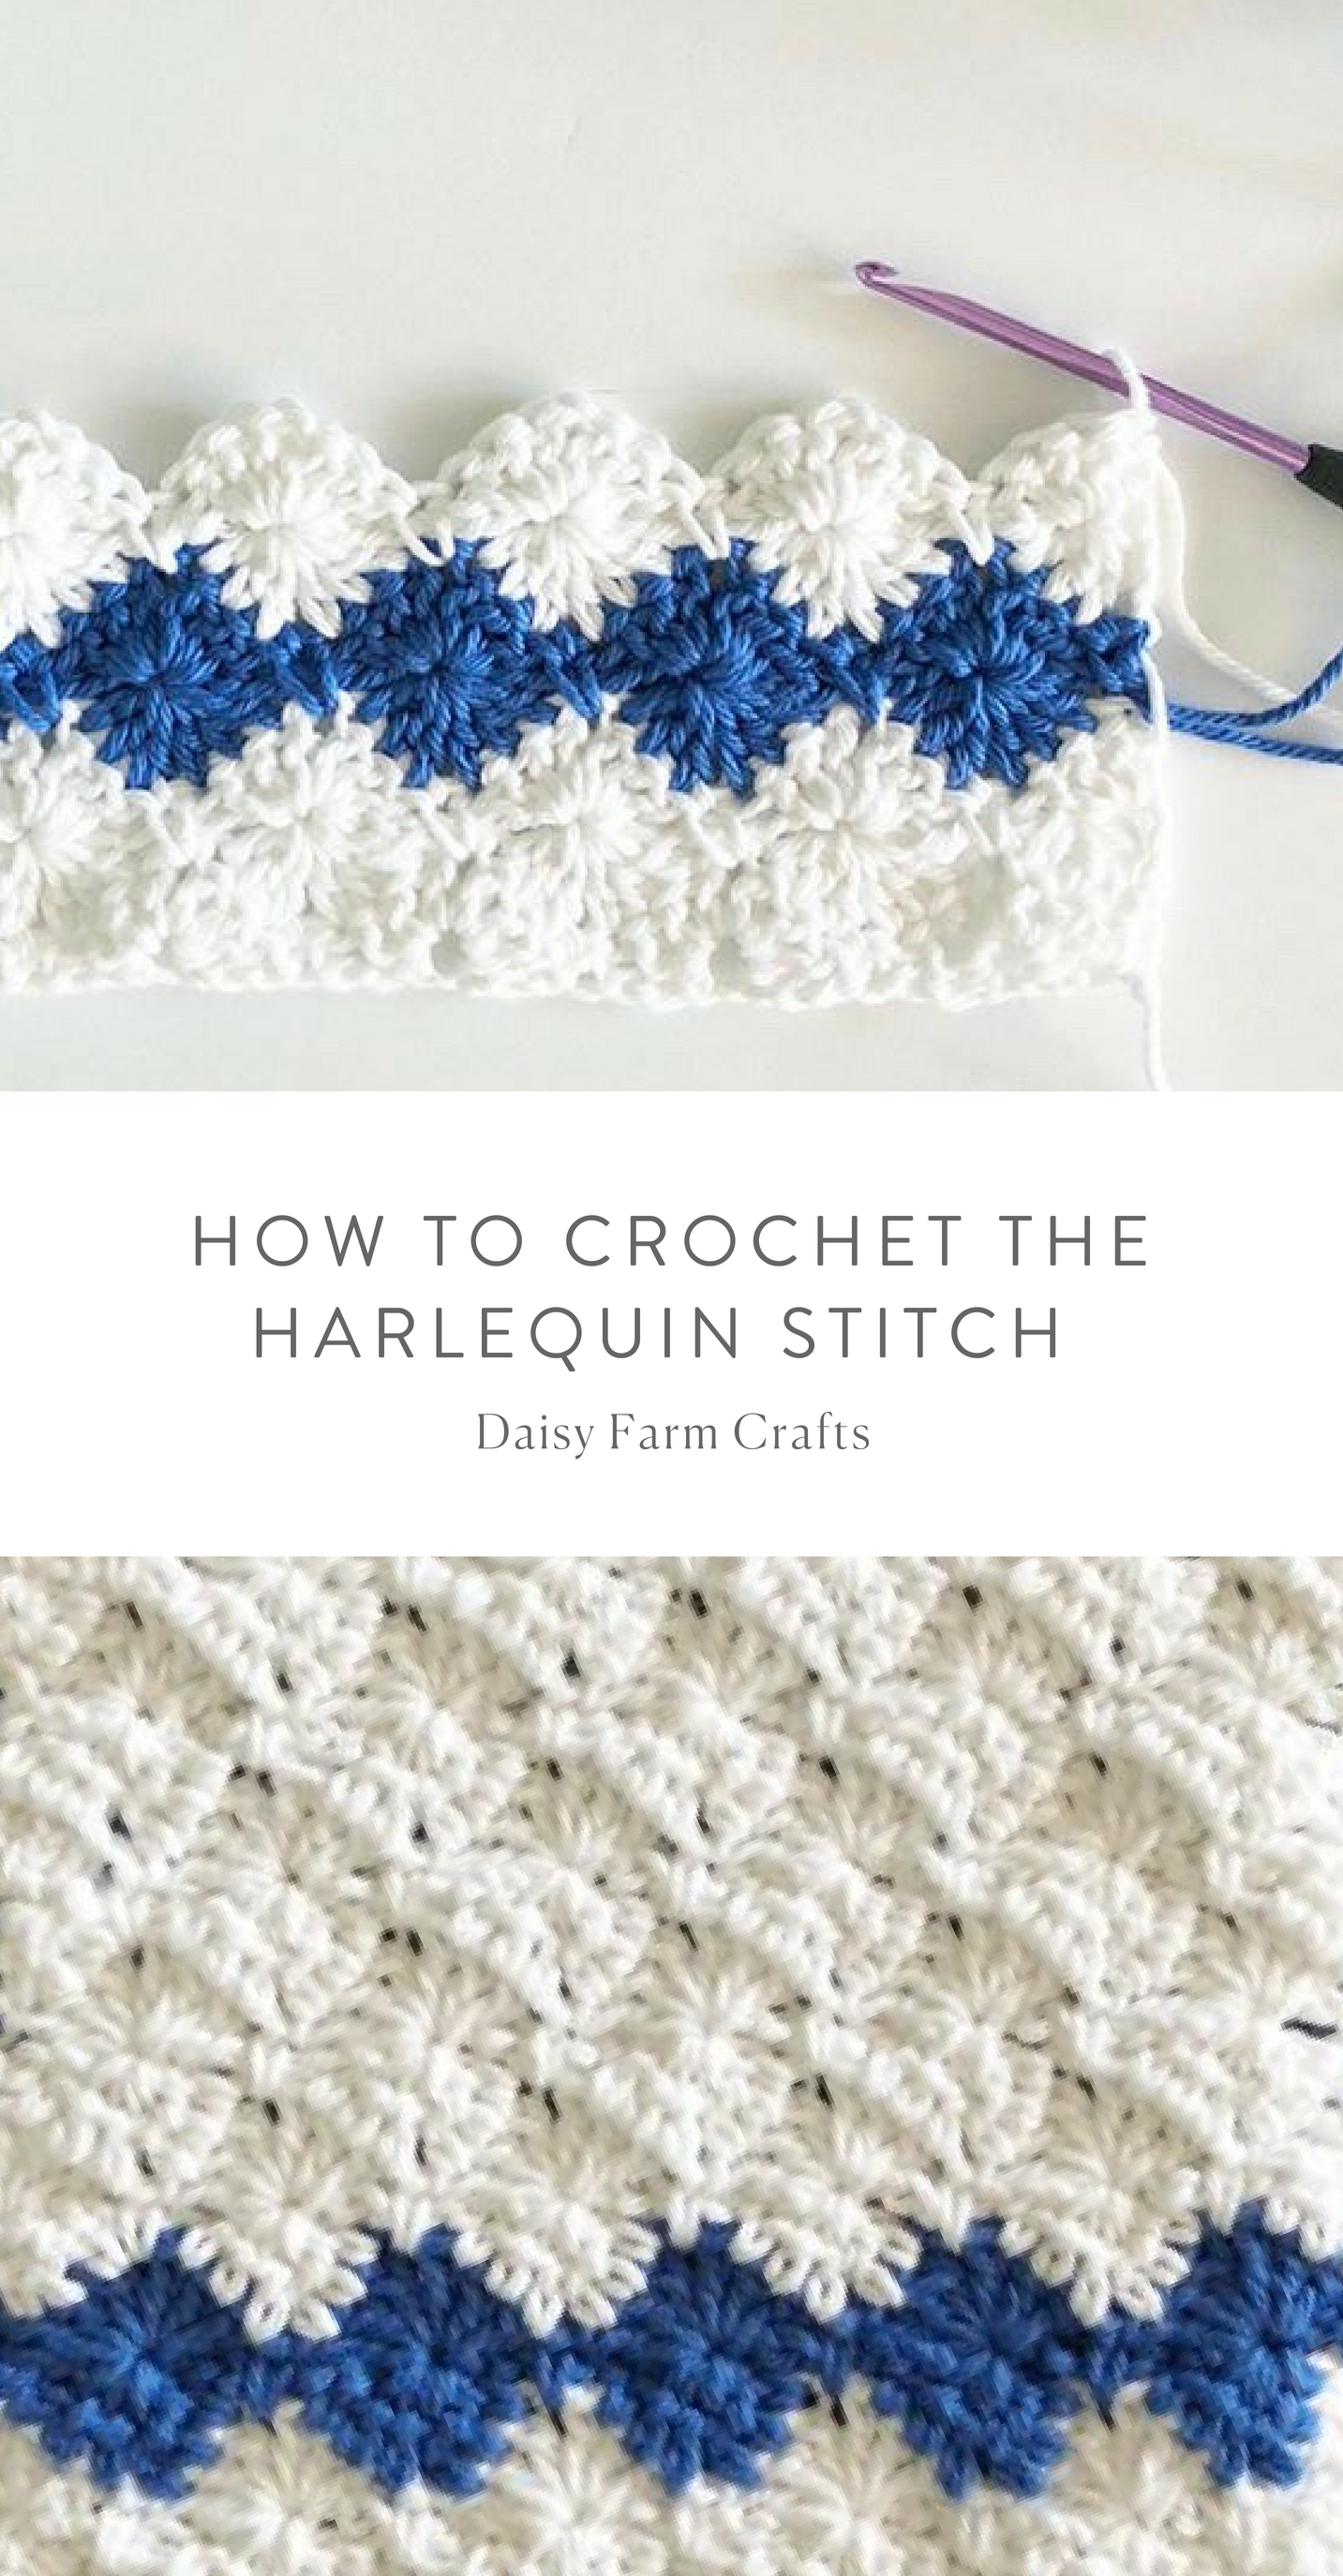 How to Crochet the Harlequin Stitch - Daisy Farm Crafts #crochet ...